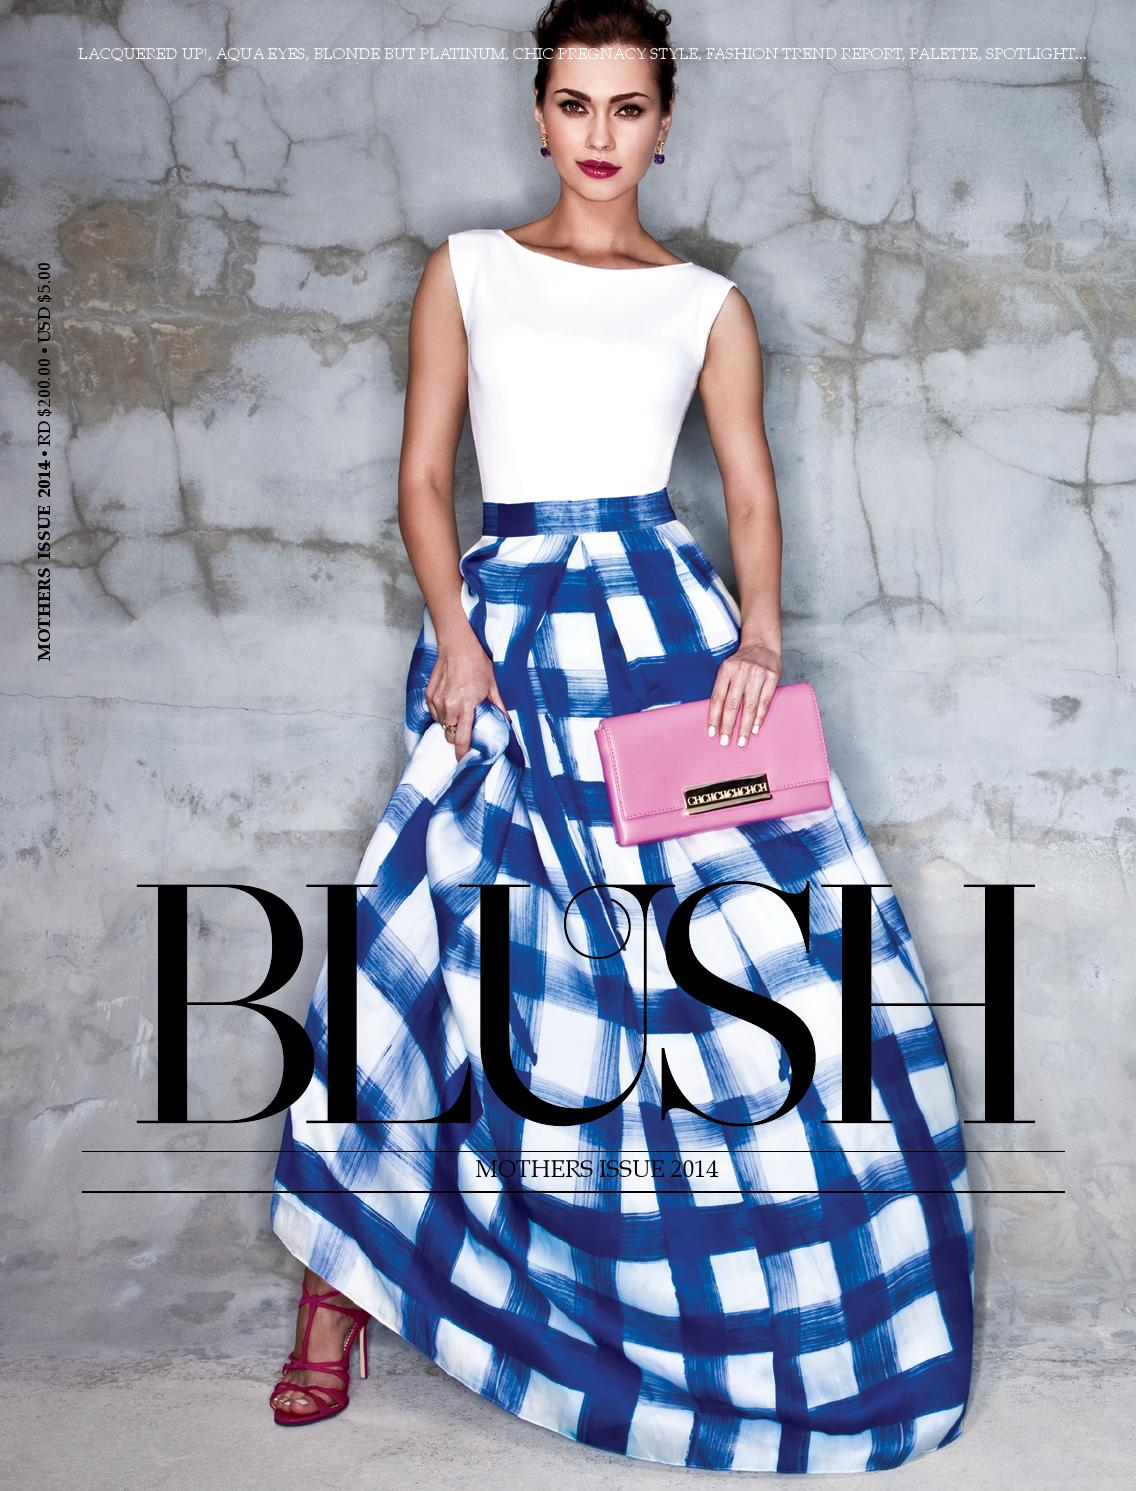 b43faee85 BLUSH MAGAZINE    Mother s Issue 2014 by BLUSH MAGAZINE - issuu